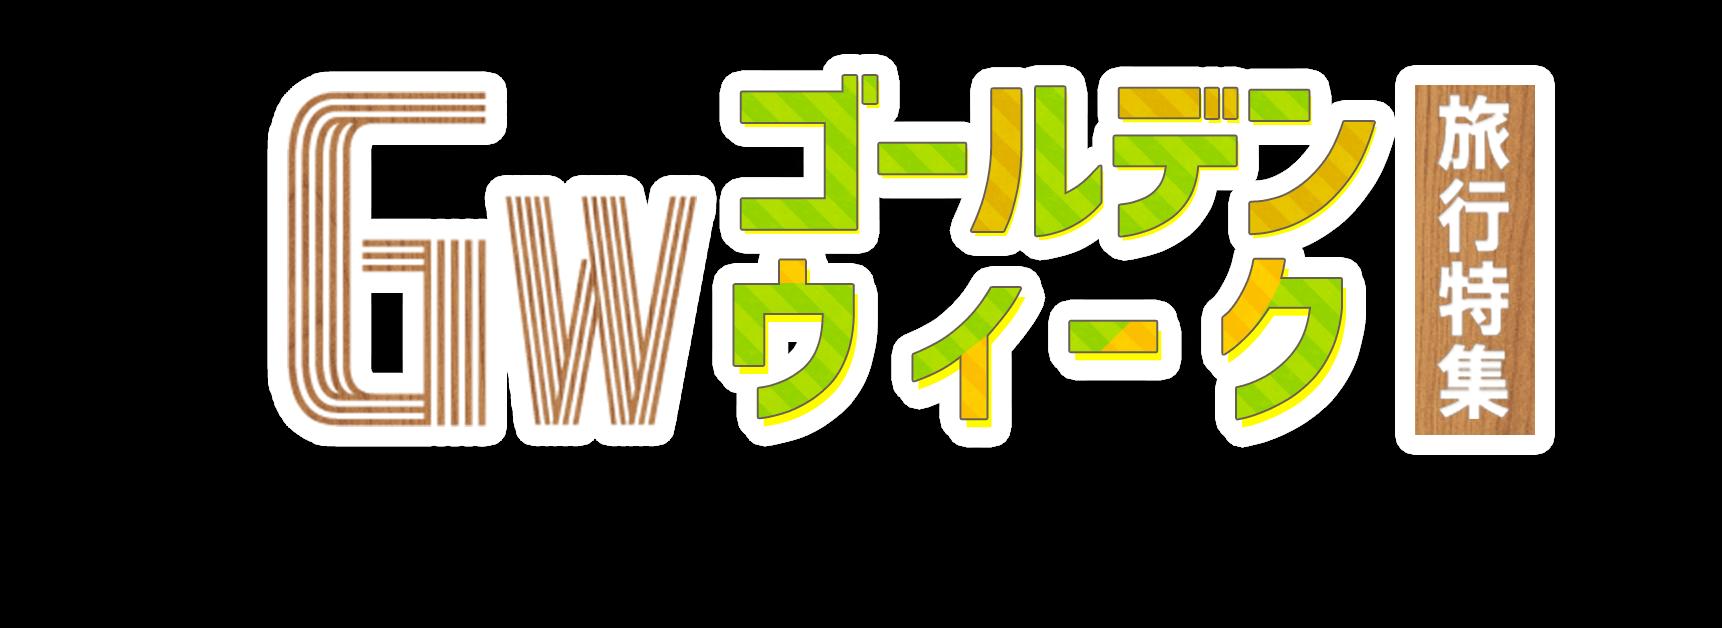 e6555ae91188 ゴールデンウィーク(GW)旅行特集2019|日本旅行